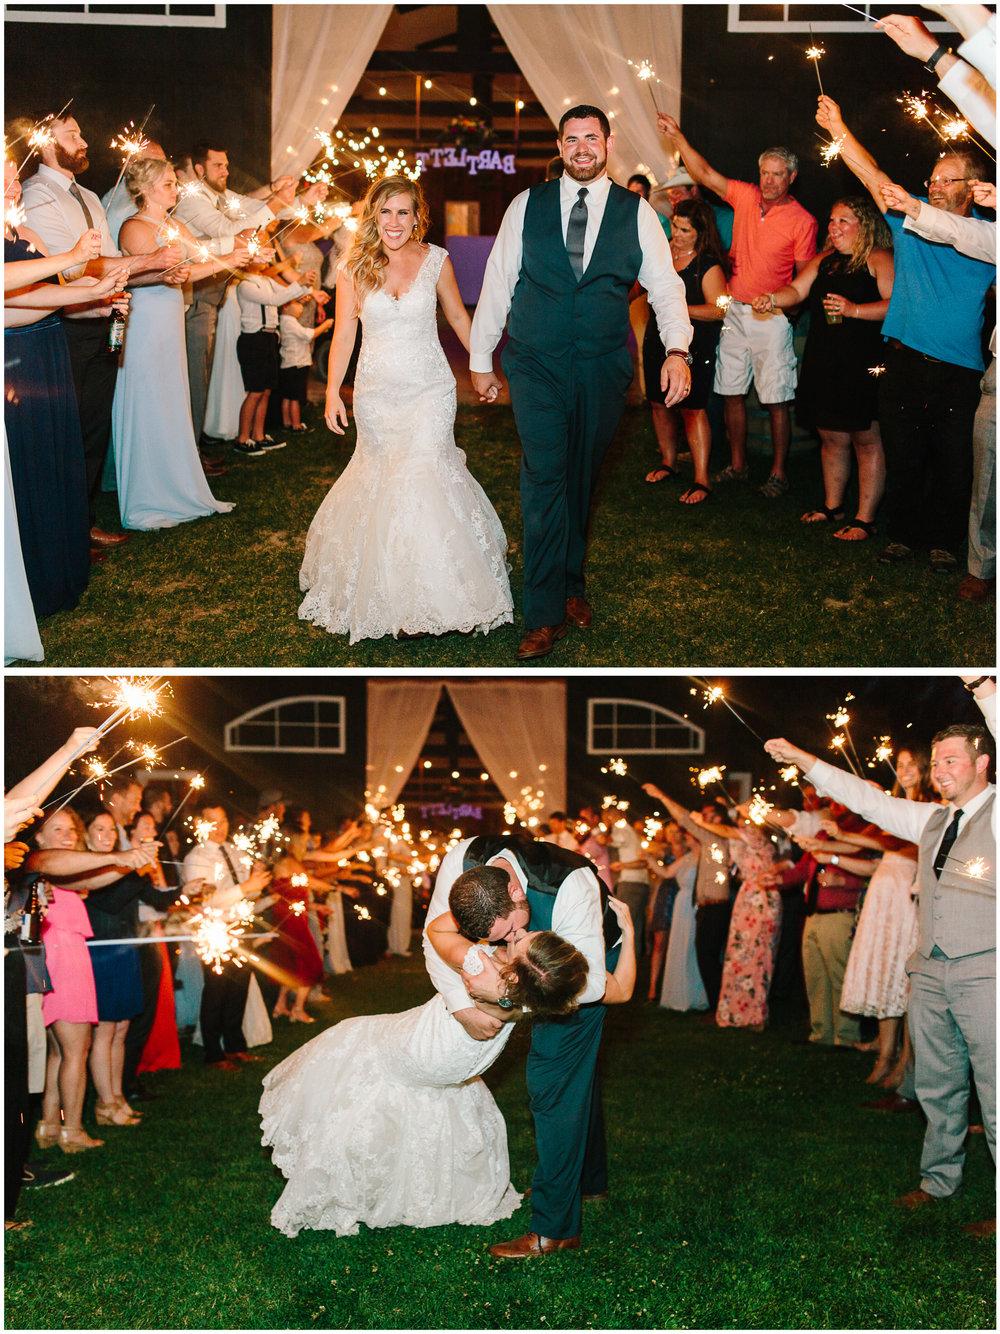 redlodge_montana_wedding_113.jpg